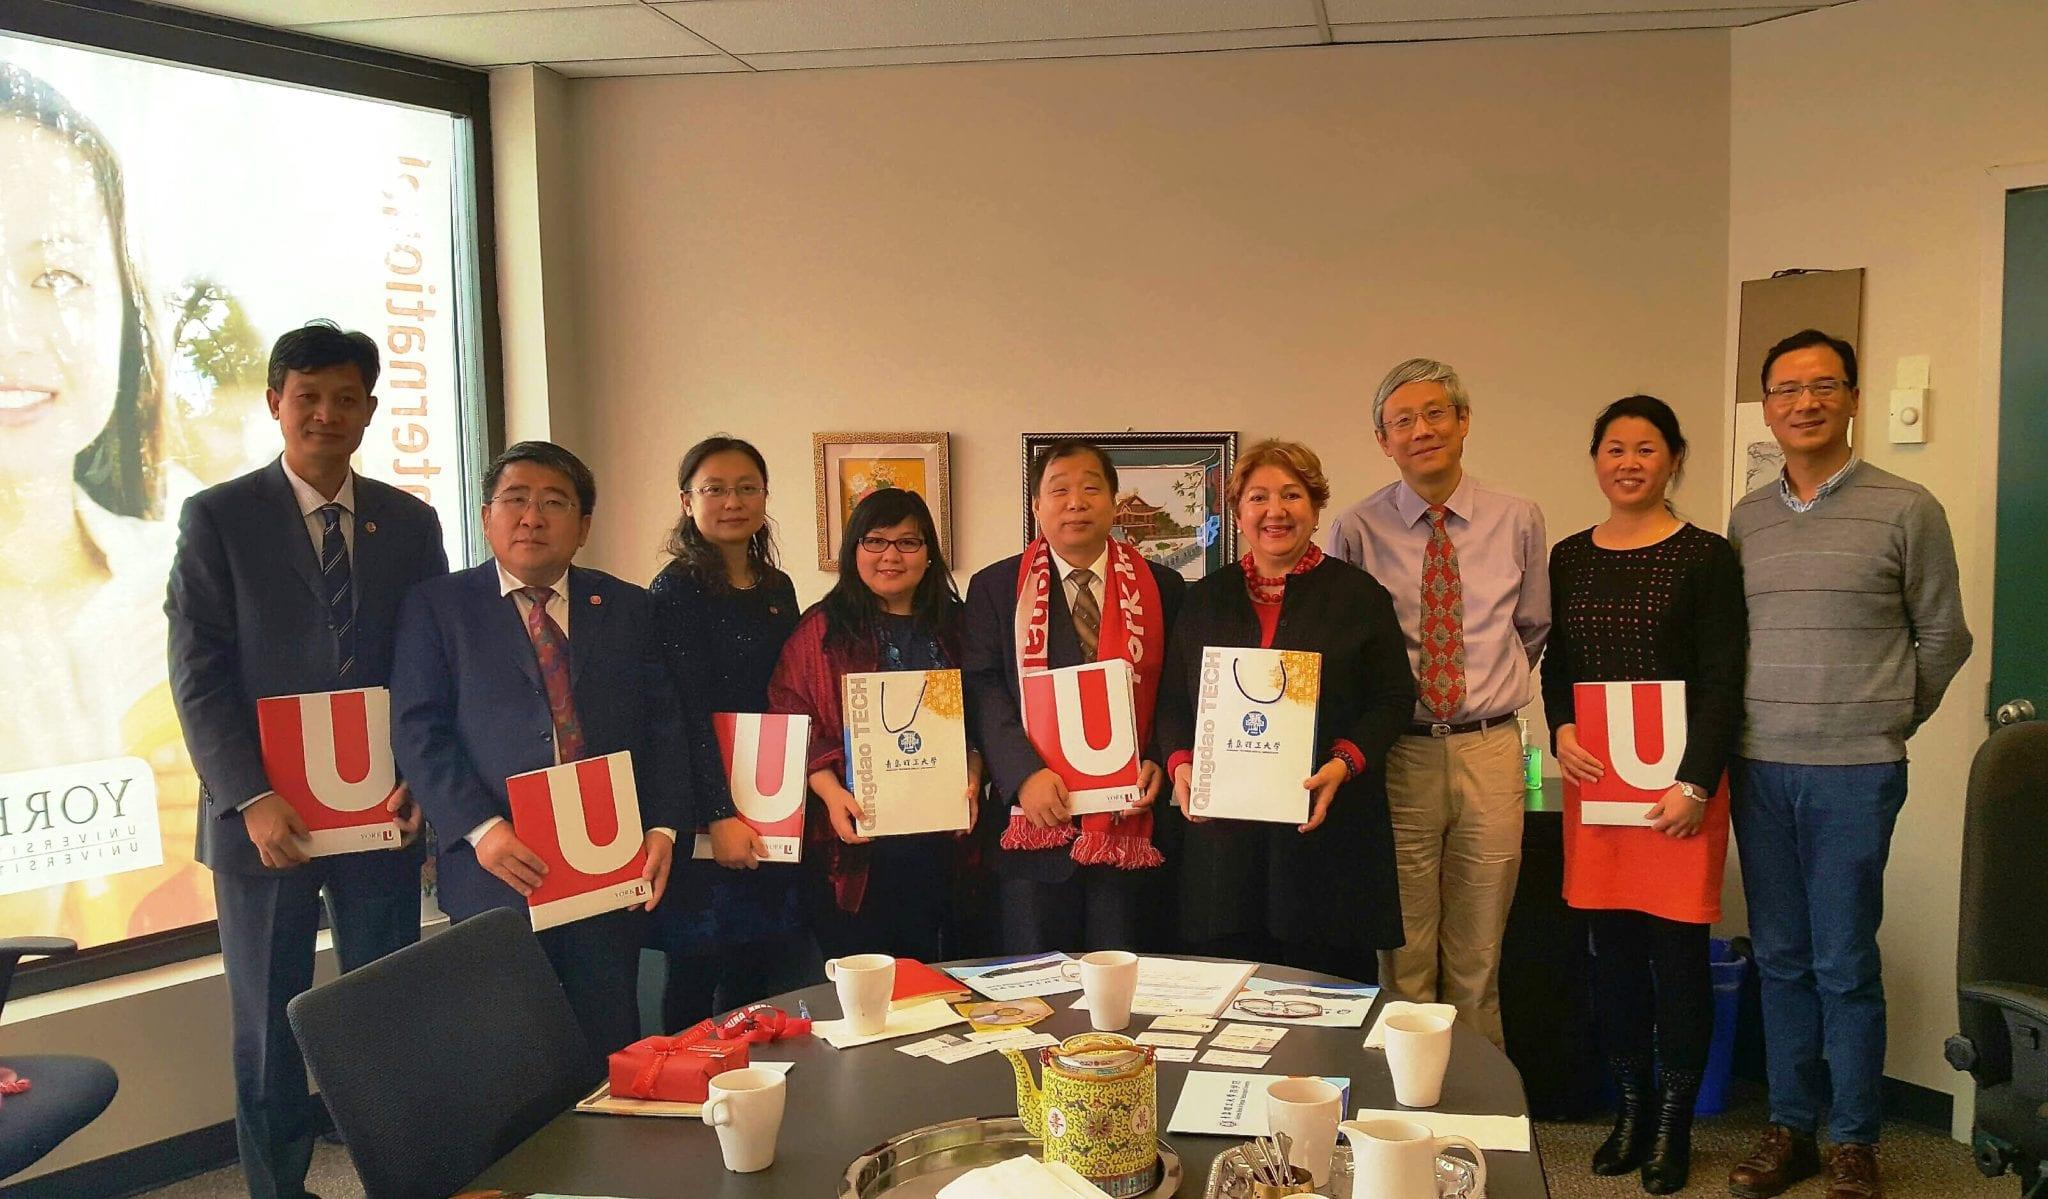 November 21, 2016 York International, Lassonde School of Engineering and Qingdao University of Technology, China